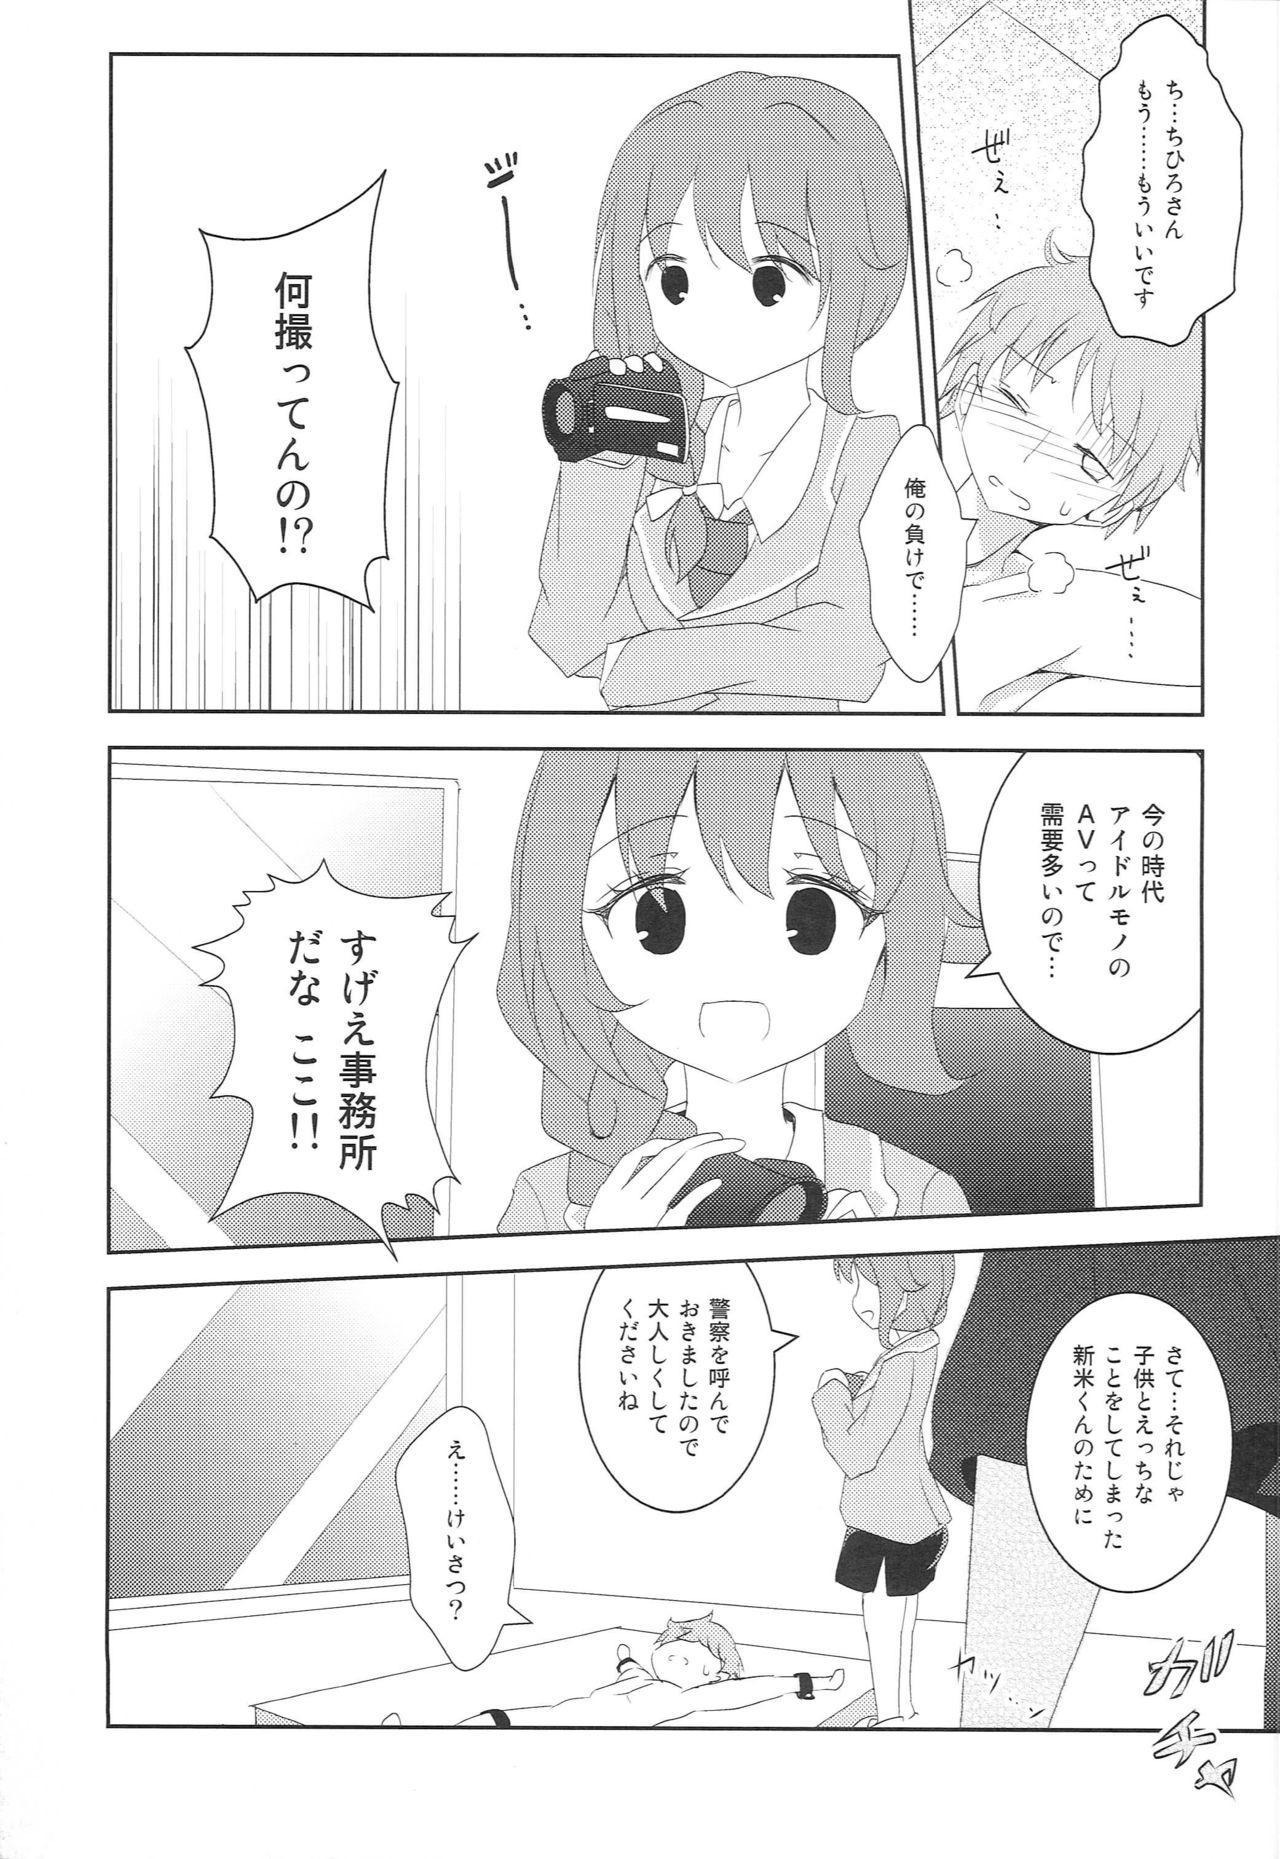 (CINDERELLA FESTIV@L) [Ribbon Enikki+ (Mickeysmith)] Chihiro-san ni Kokuhaku Shitara, Idol-tachi ni Mawasaretanda ga. (THE IDOLM@STER CINDERELLA GIRLS) 11